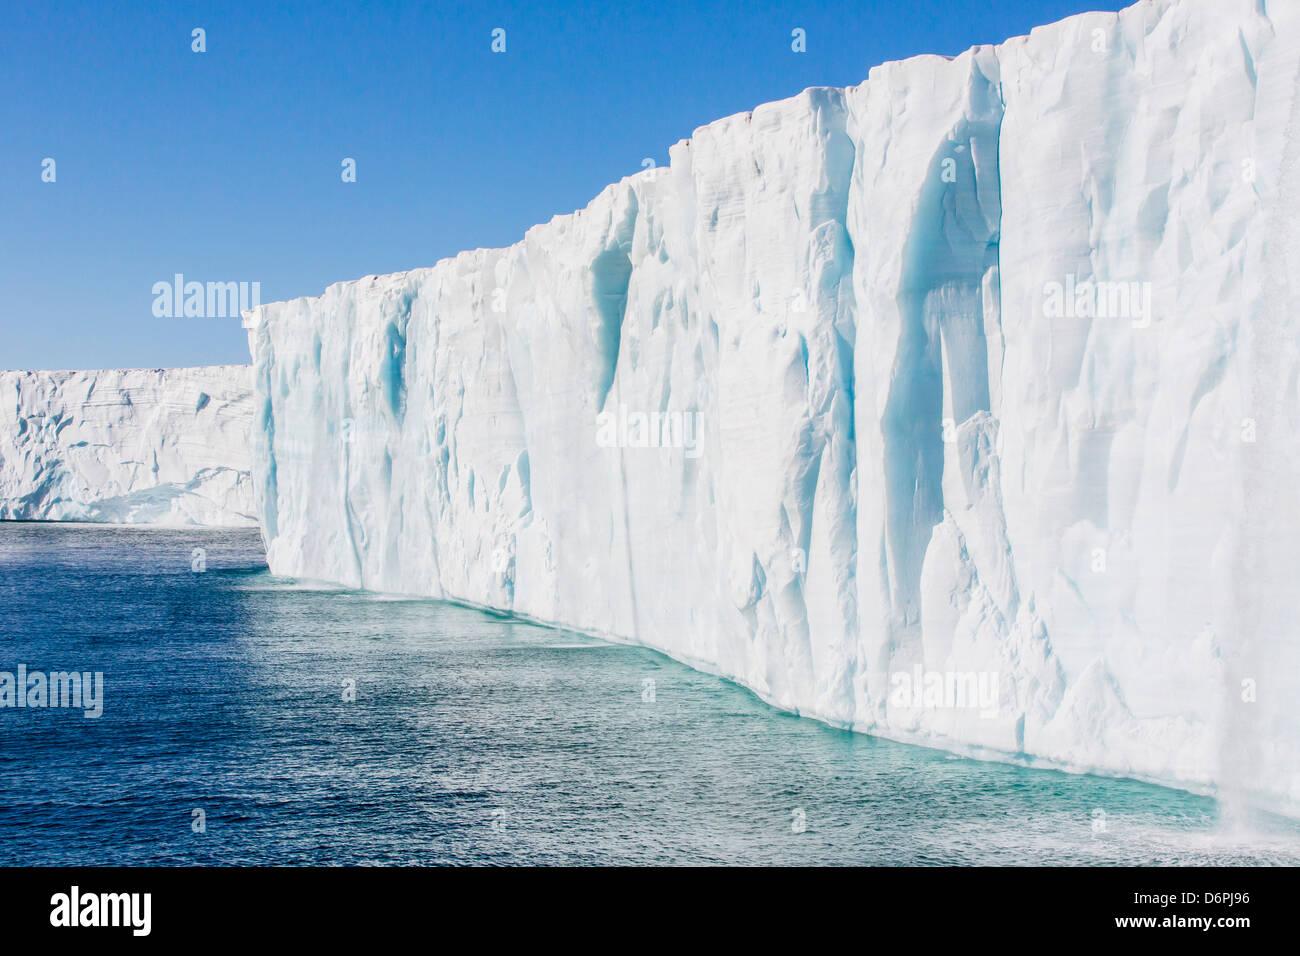 Eiskappe Austfonna, Nordaustlandet, Spitzbergen, Norwegen, Skandinavien, Europa Stockbild